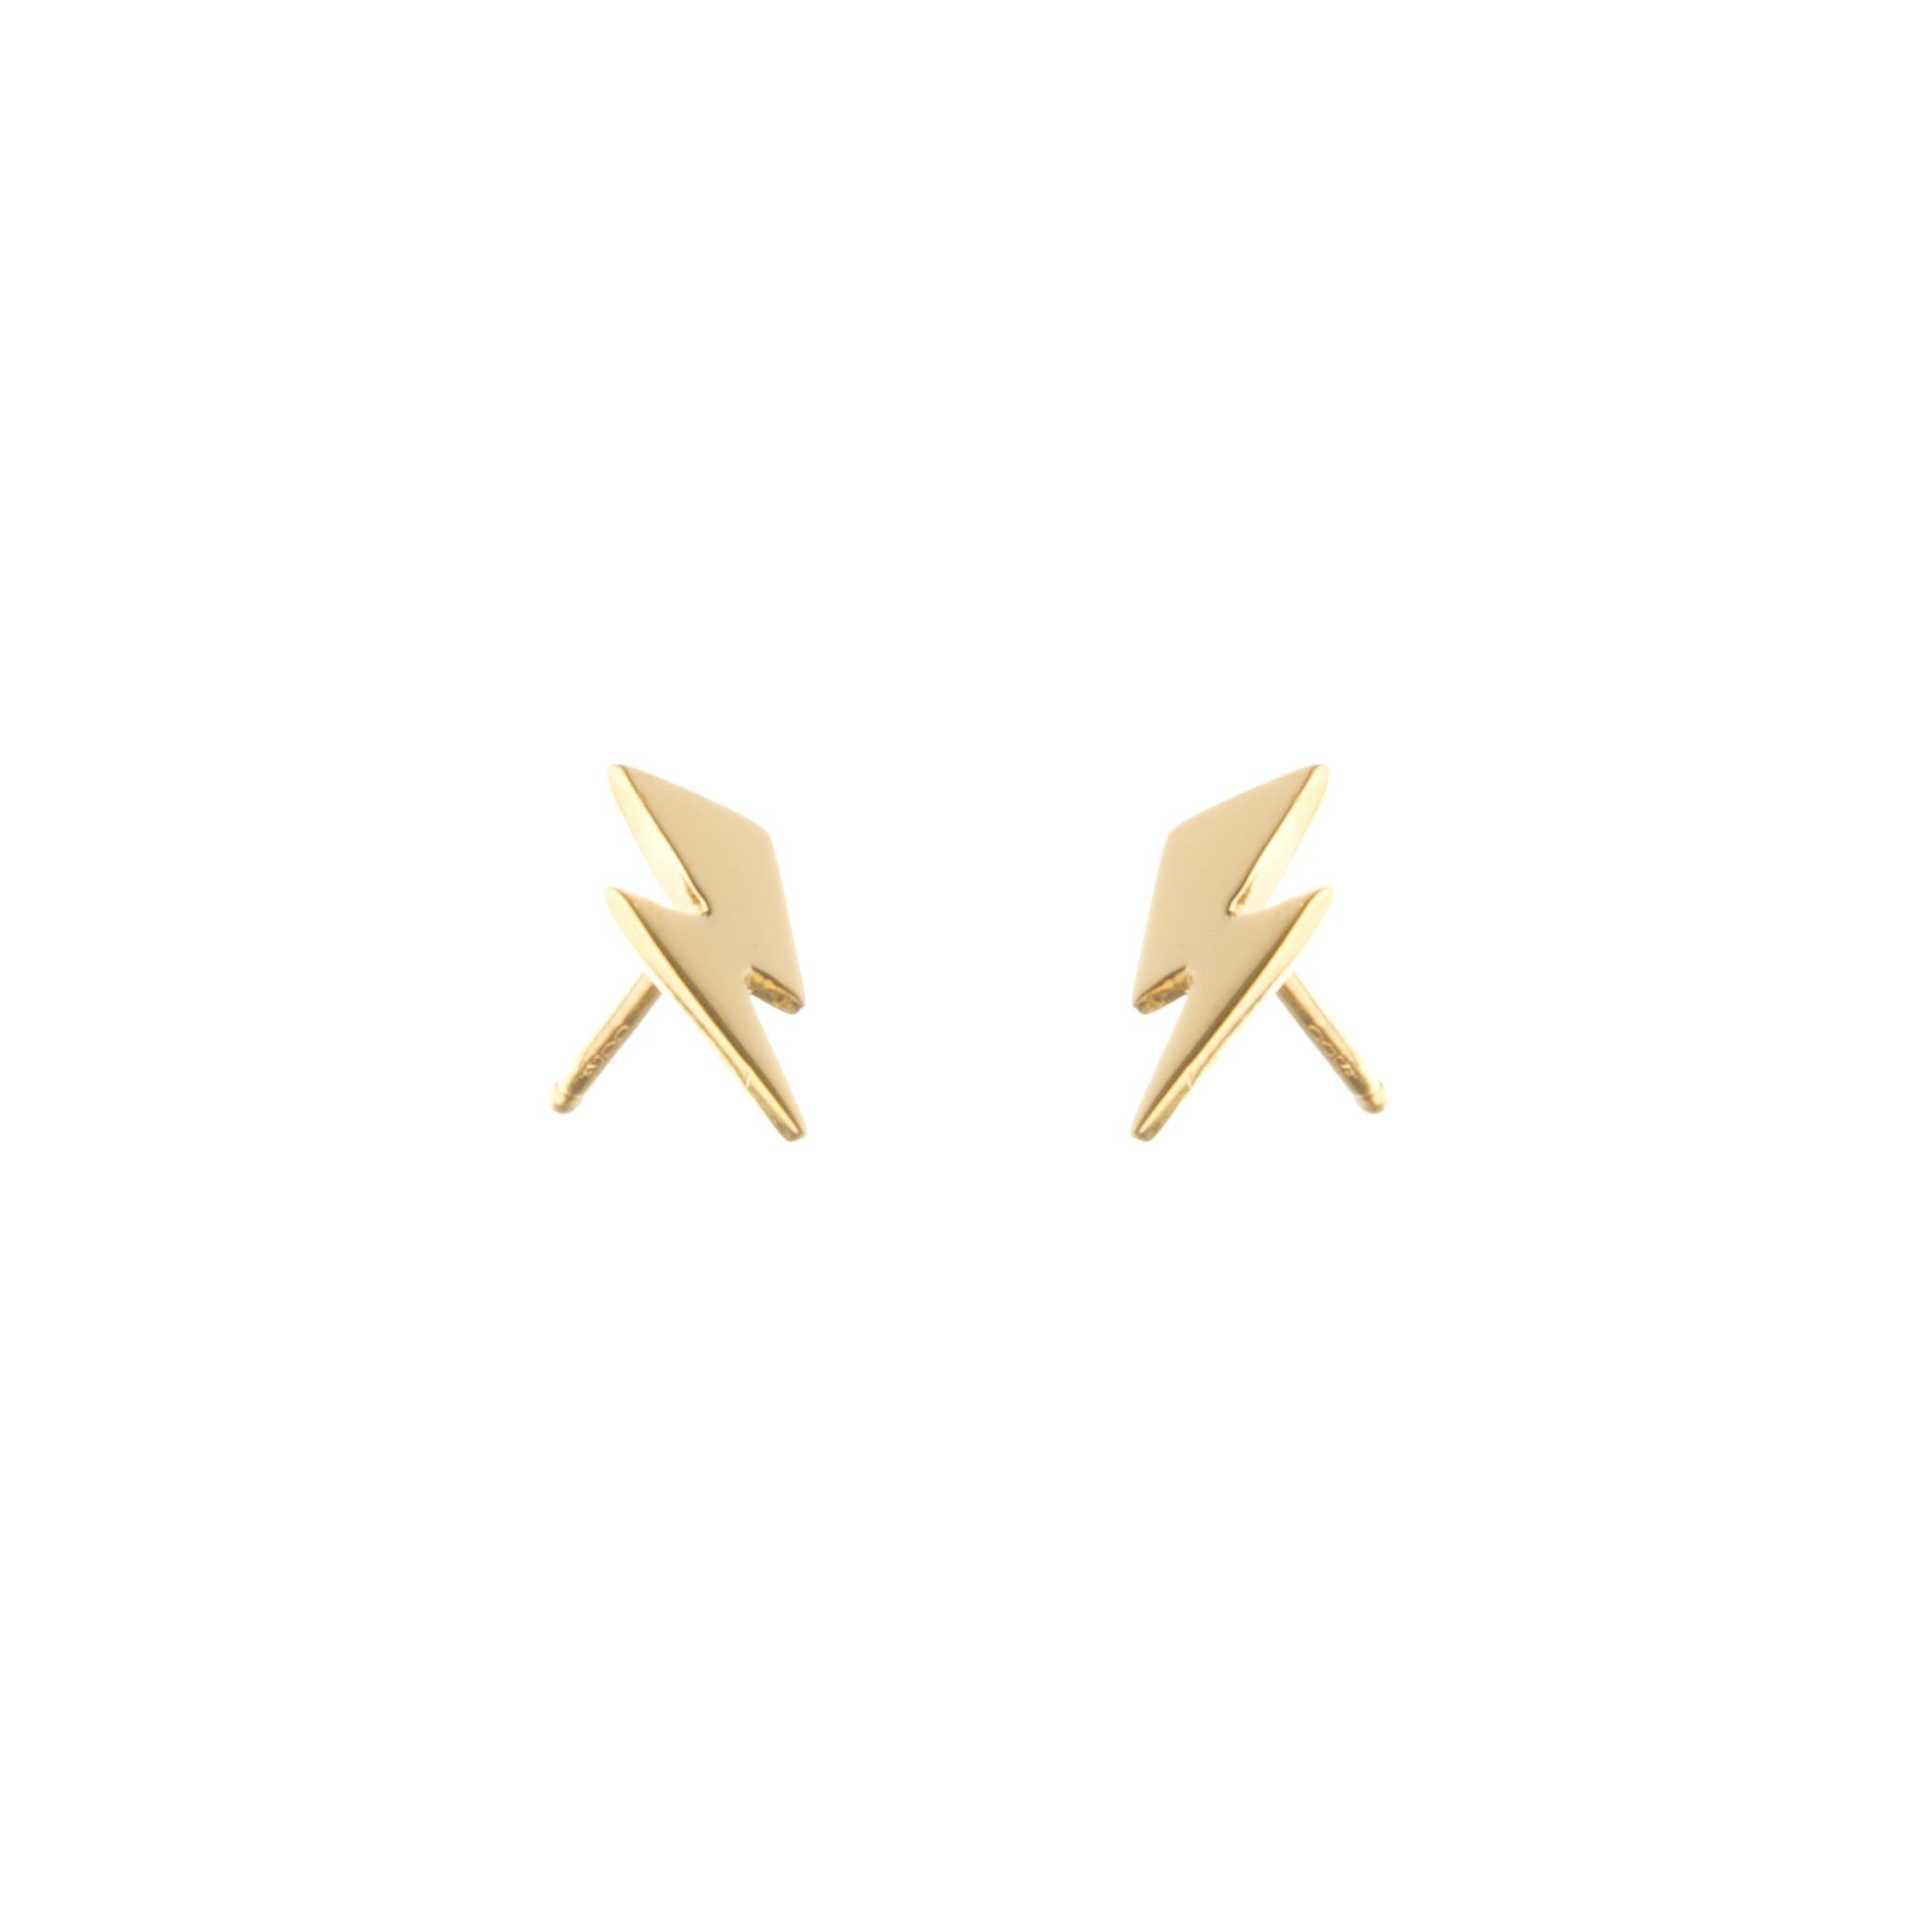 BOWIE-flash-stud-earrings-gold-vermeil